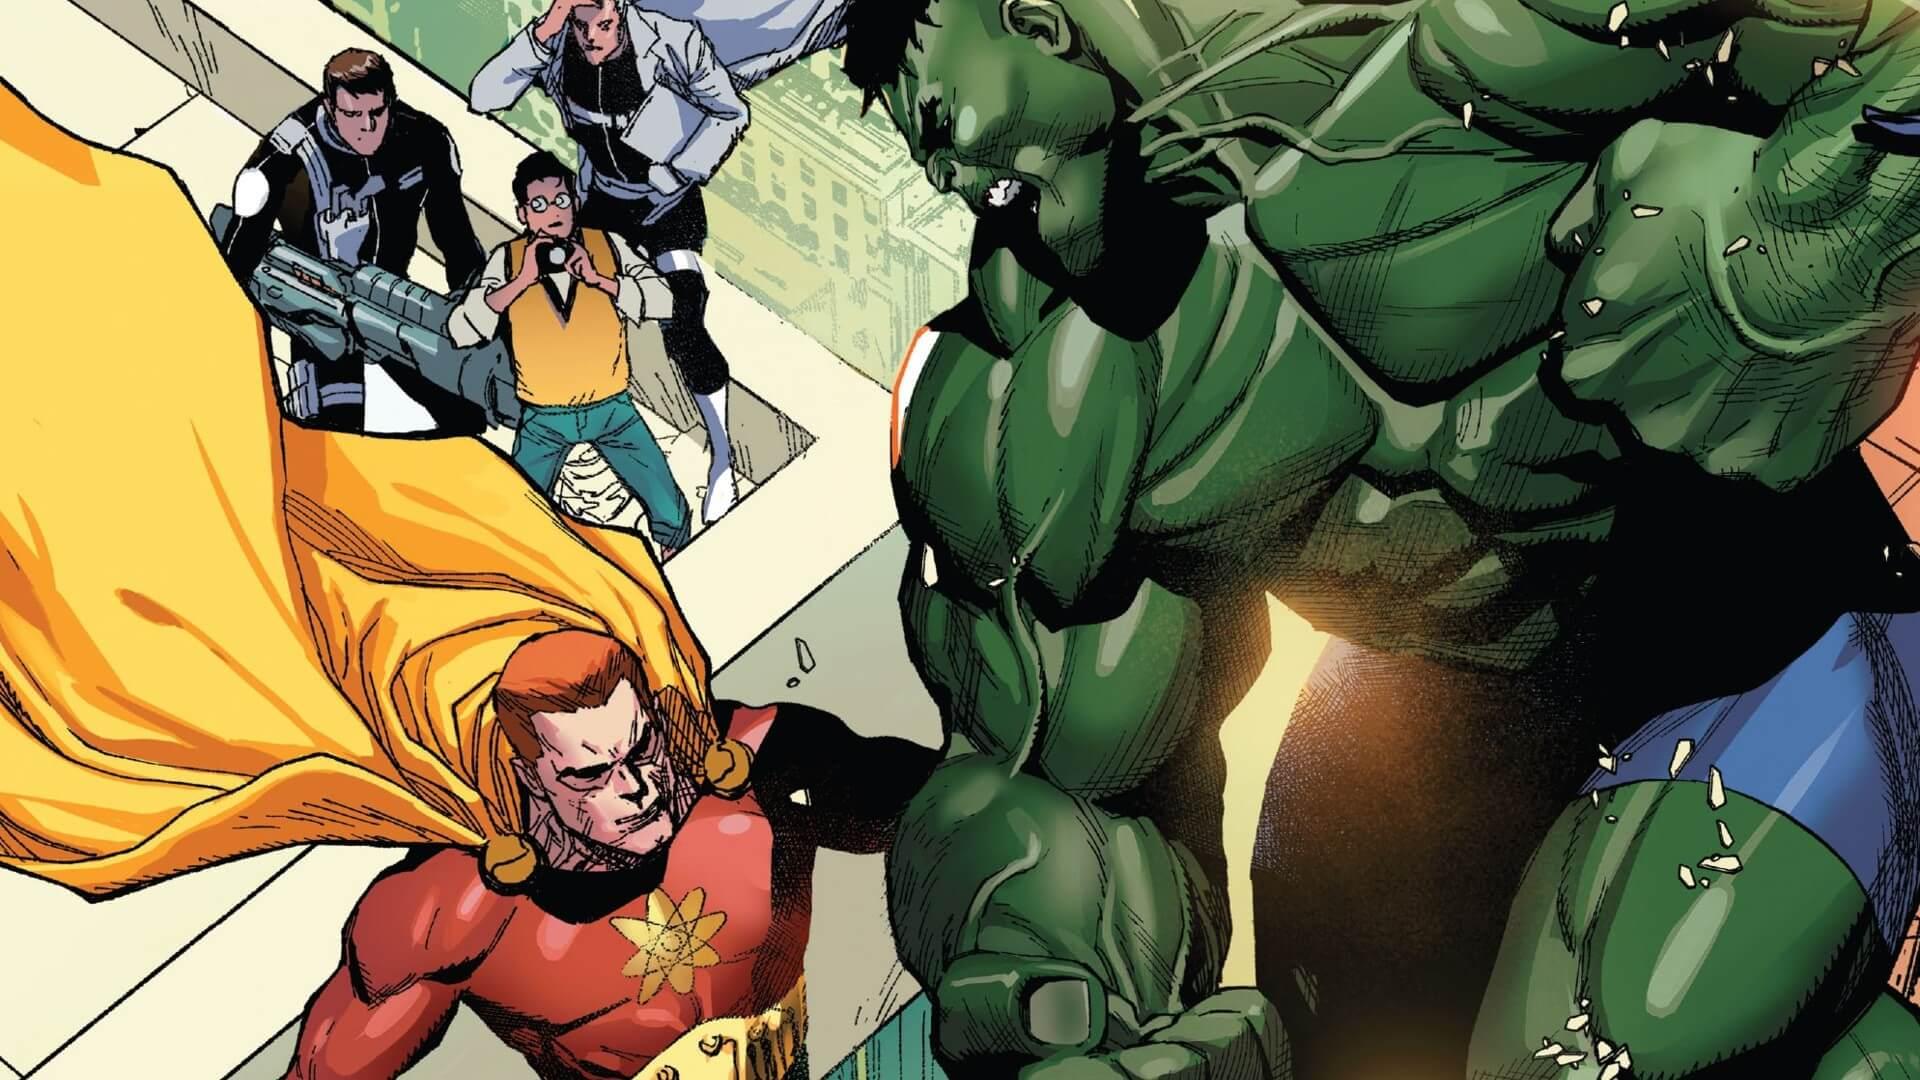 Hyperion--Marvel's Superman--Just Killed the Hulk